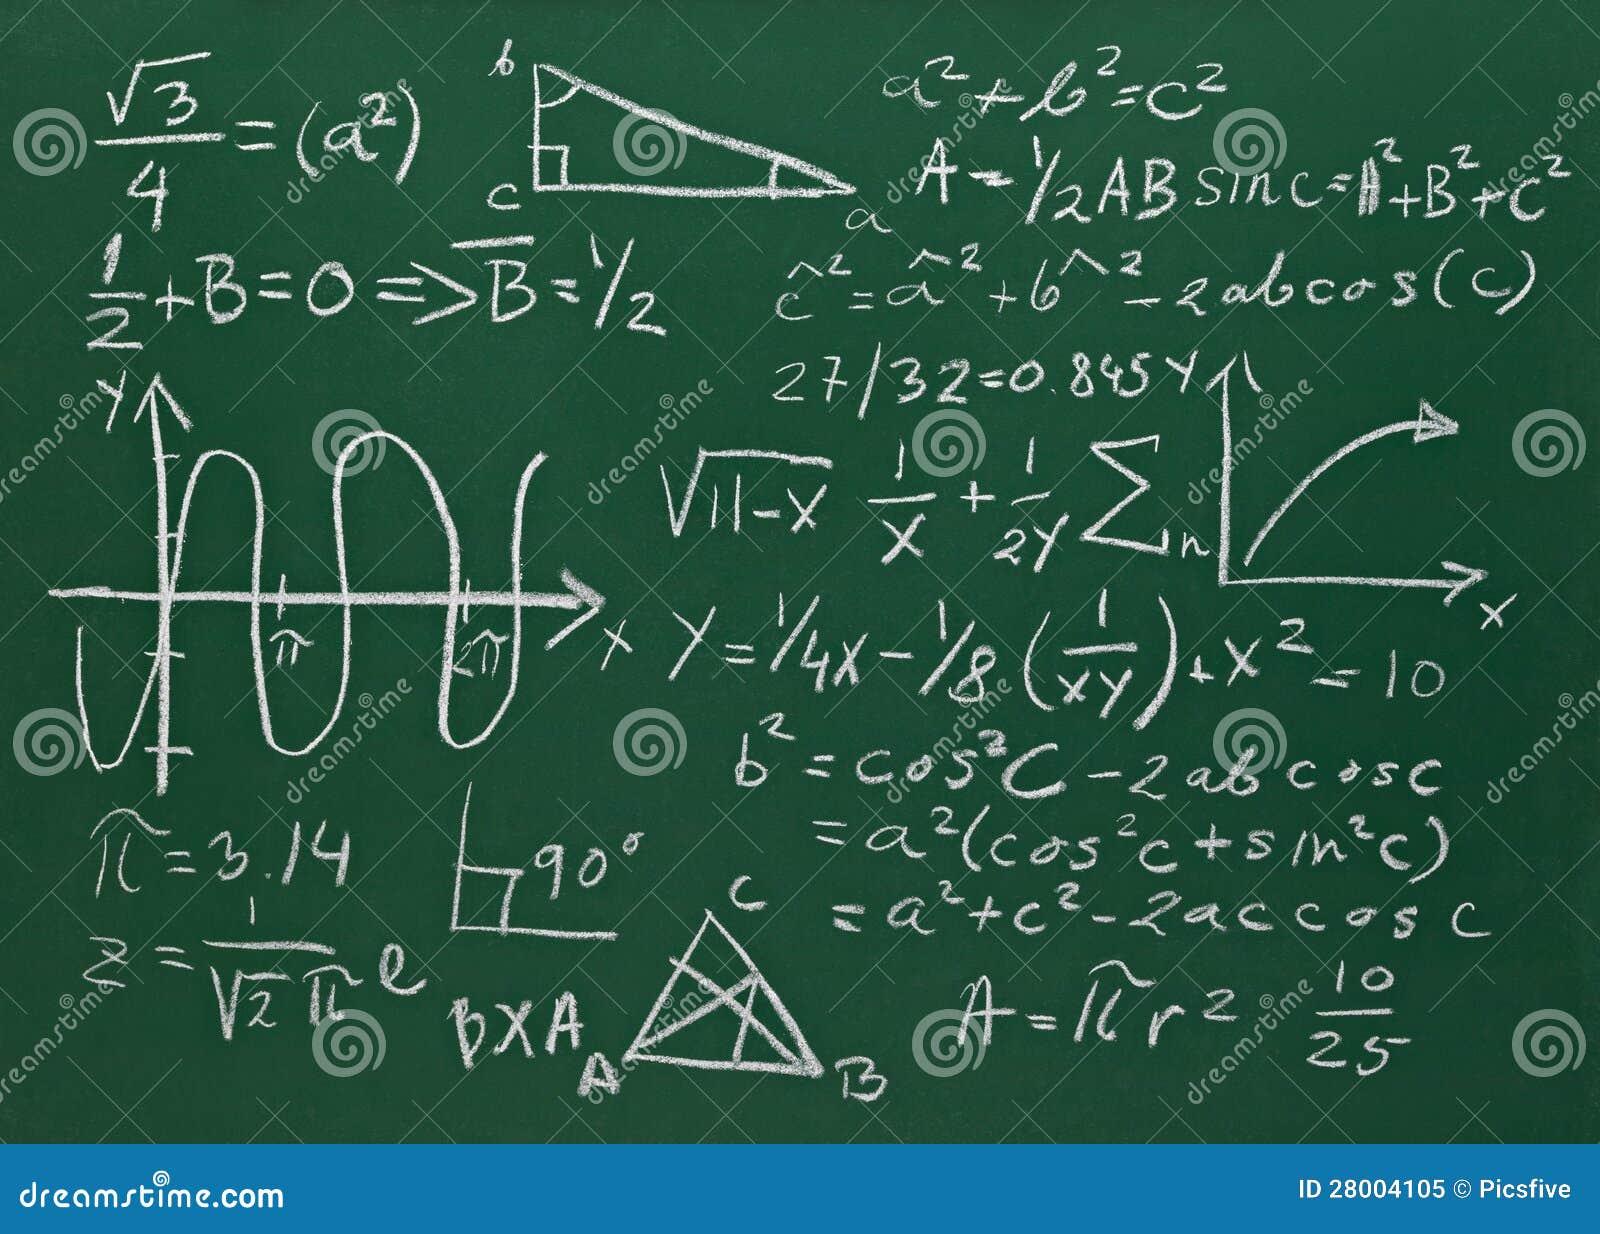 math formulas on school blackboard education royalty free stock photo image 28004105 algebra 2 clipart algebra 2 clipart